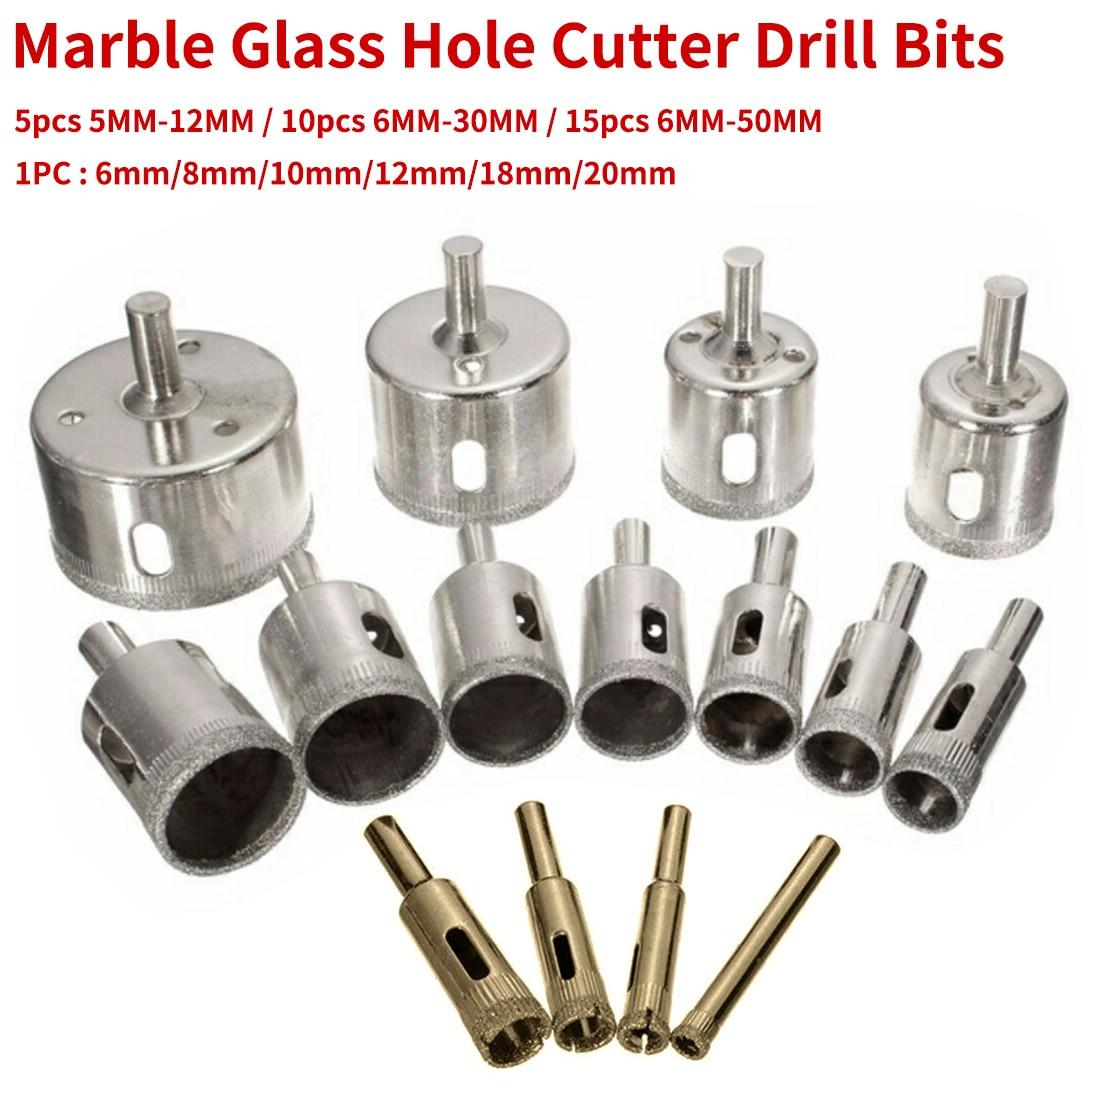 5Pcs Diamond Hole Saw Drill Bits Set Tile Ceramic Cutter Glass Marble 5mm-12mm